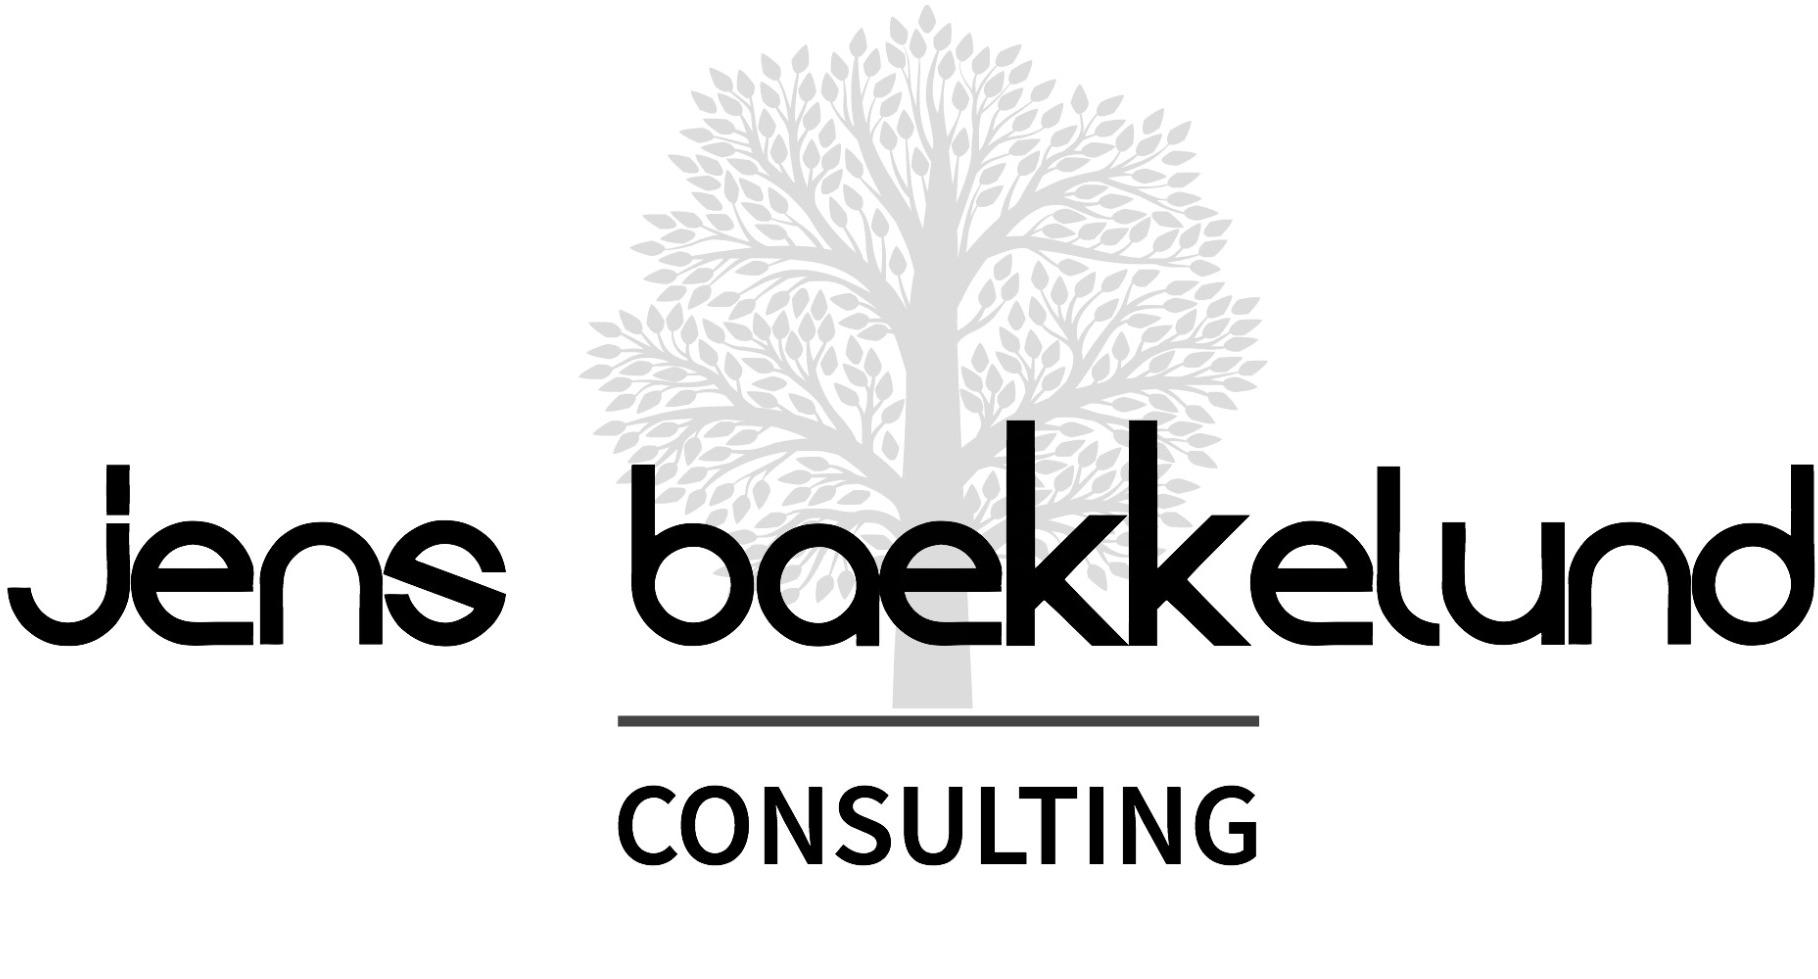 Jens Bækkelund Consulting